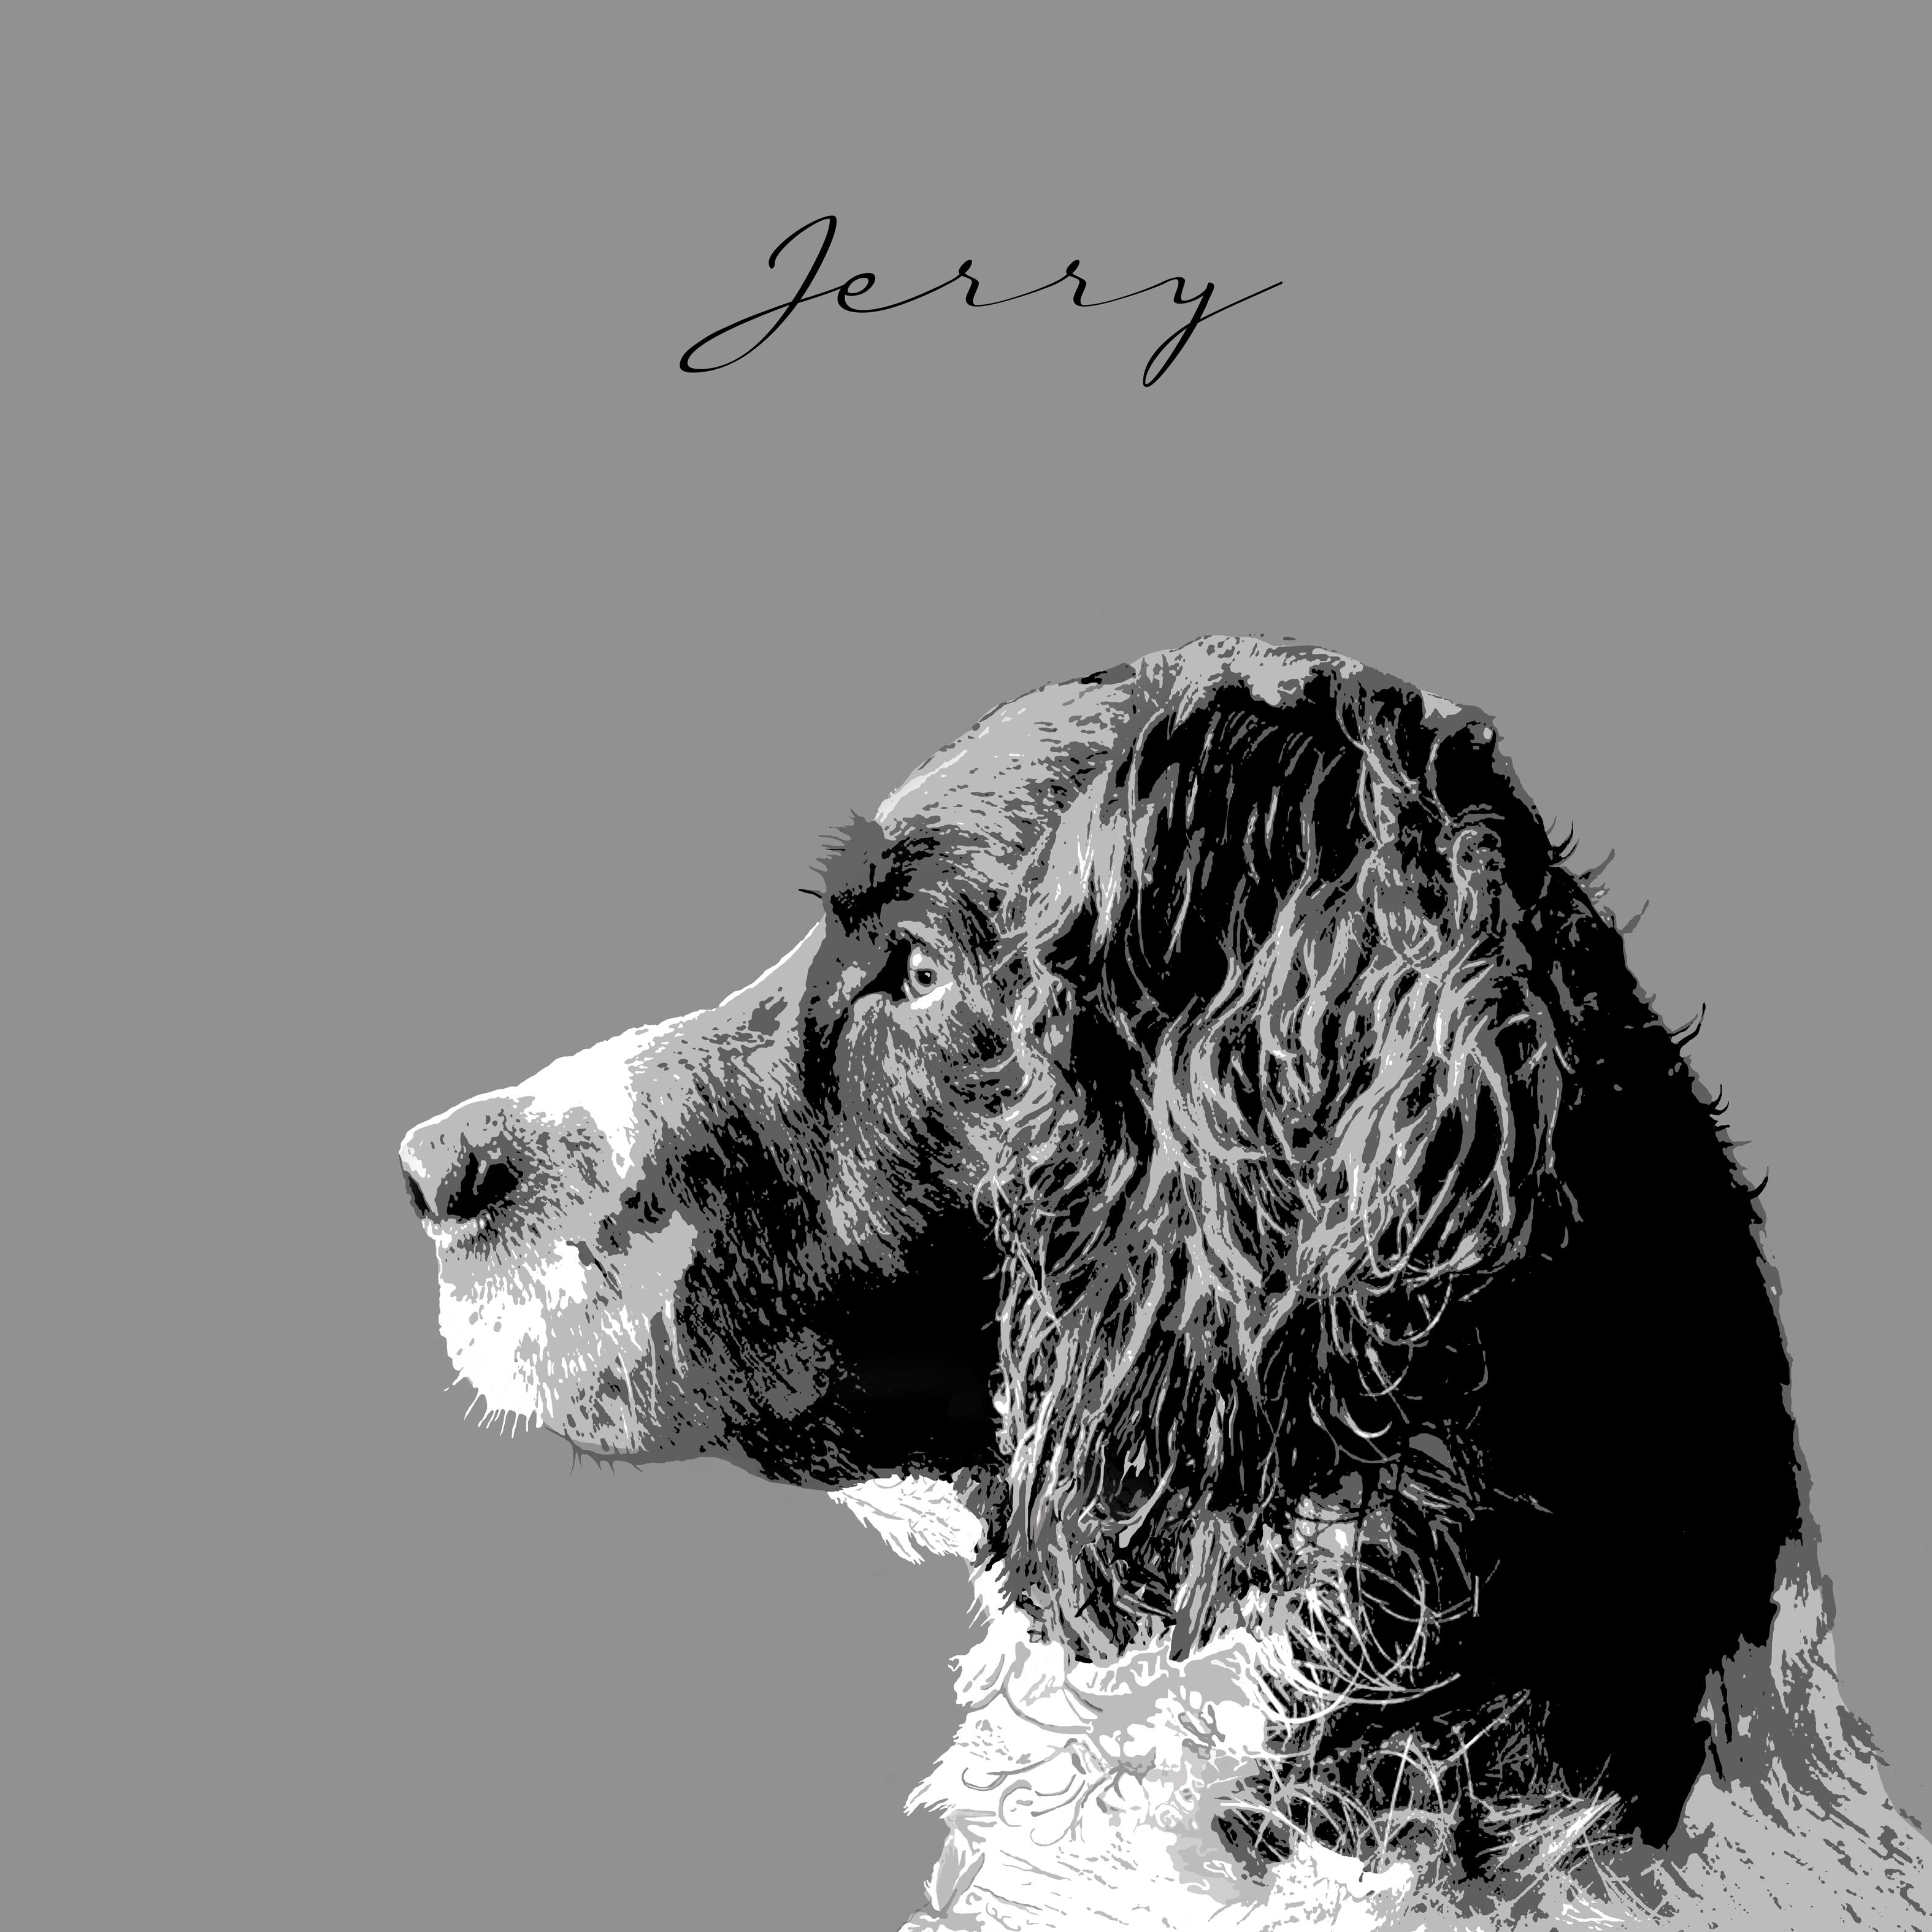 Jerry - Mock up of pet portraits